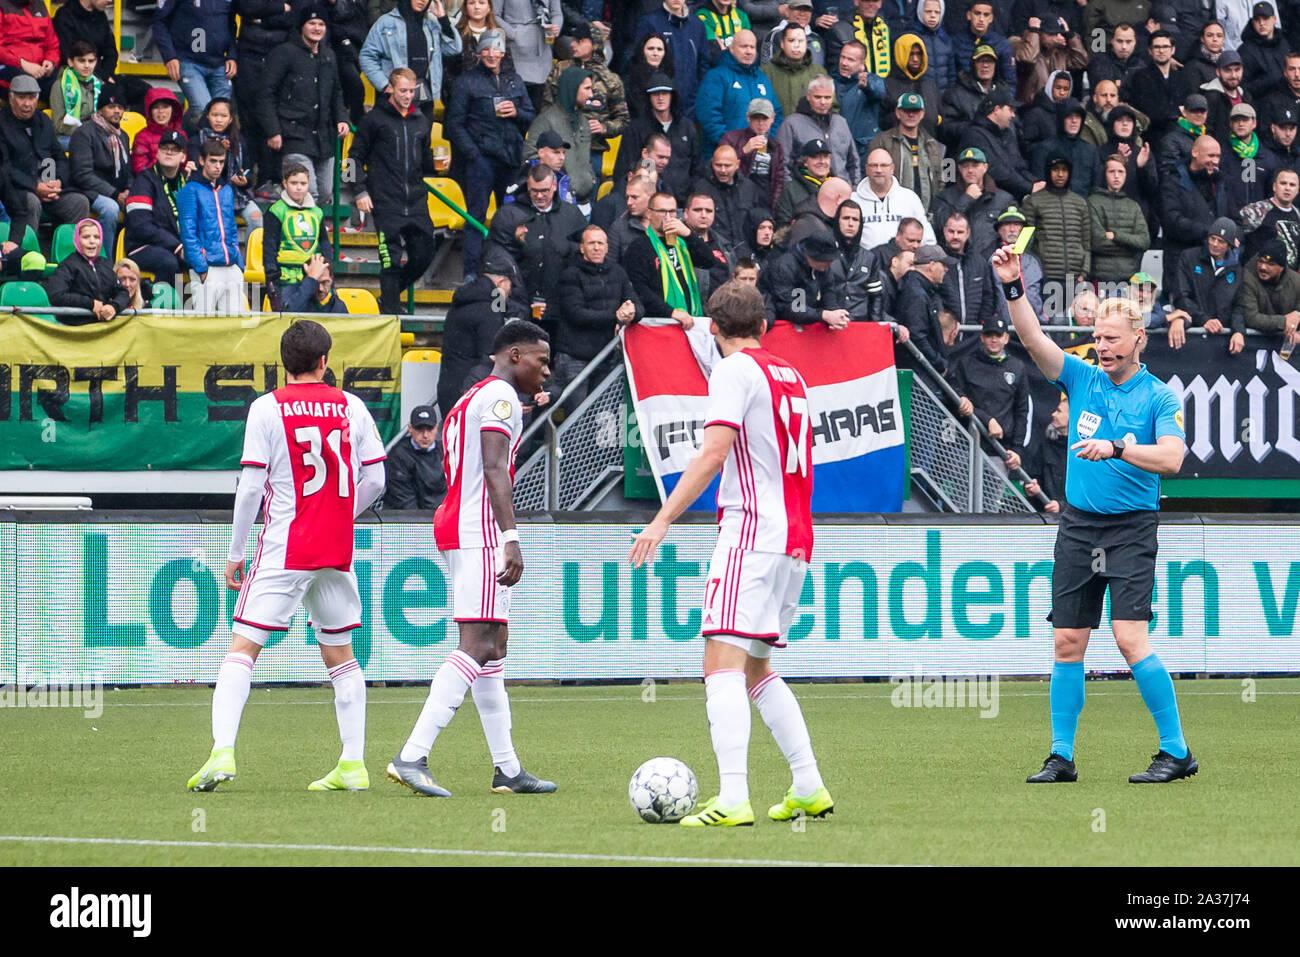 Den Haag Netherlands 06th Oct 2019 Football Dutch Eredivisie Season 2019 2020 Cars Jeans Stadion Ado